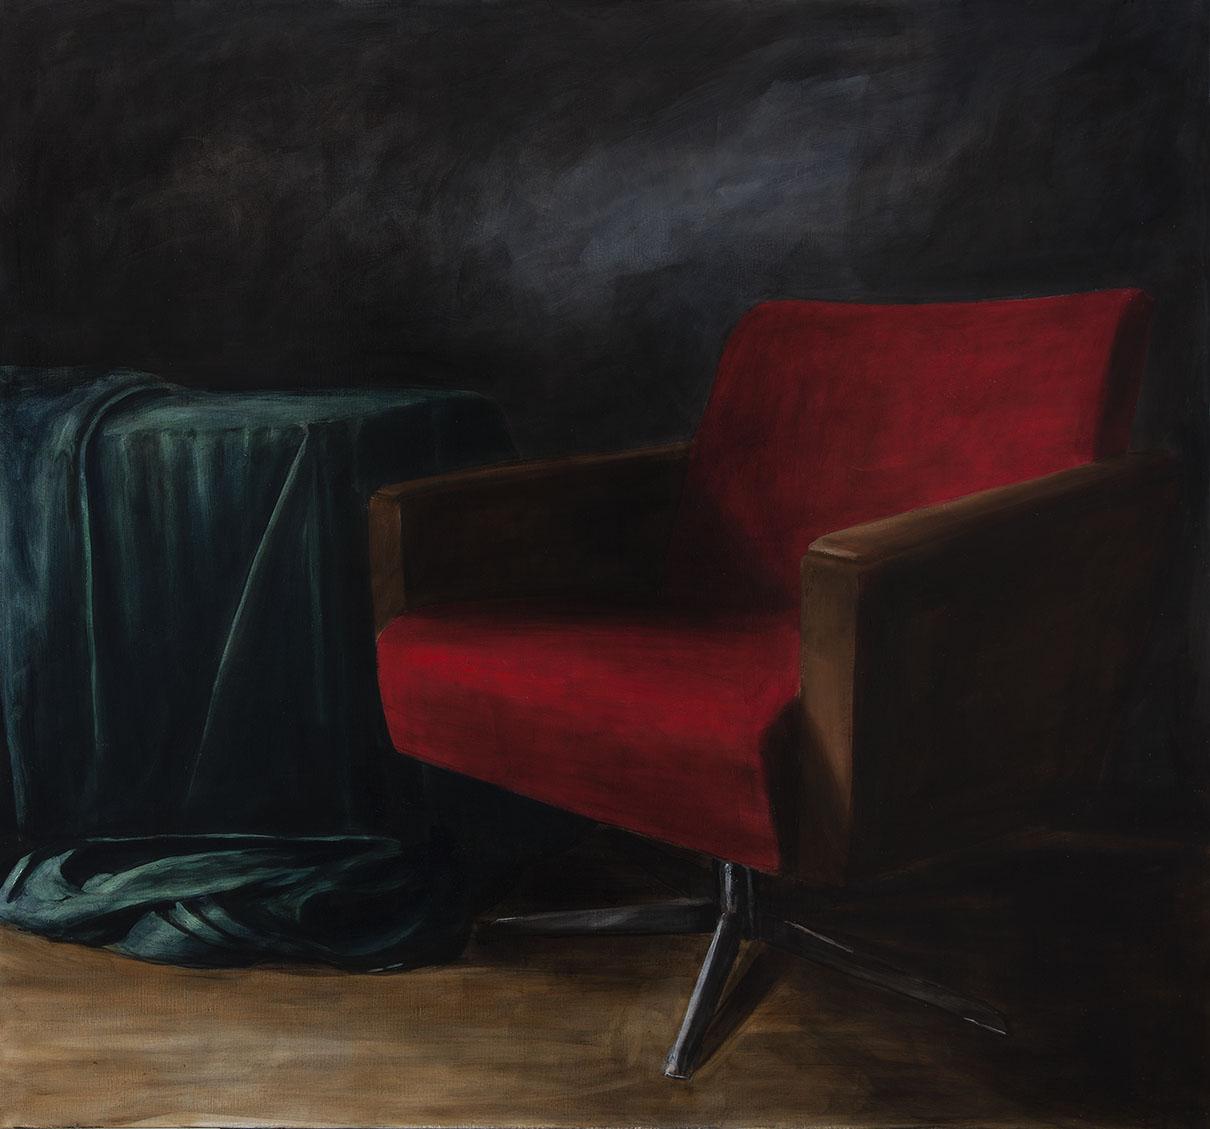 """alles einpacken"", 2017, 120 x 130 cm, öl/ Leinwand"